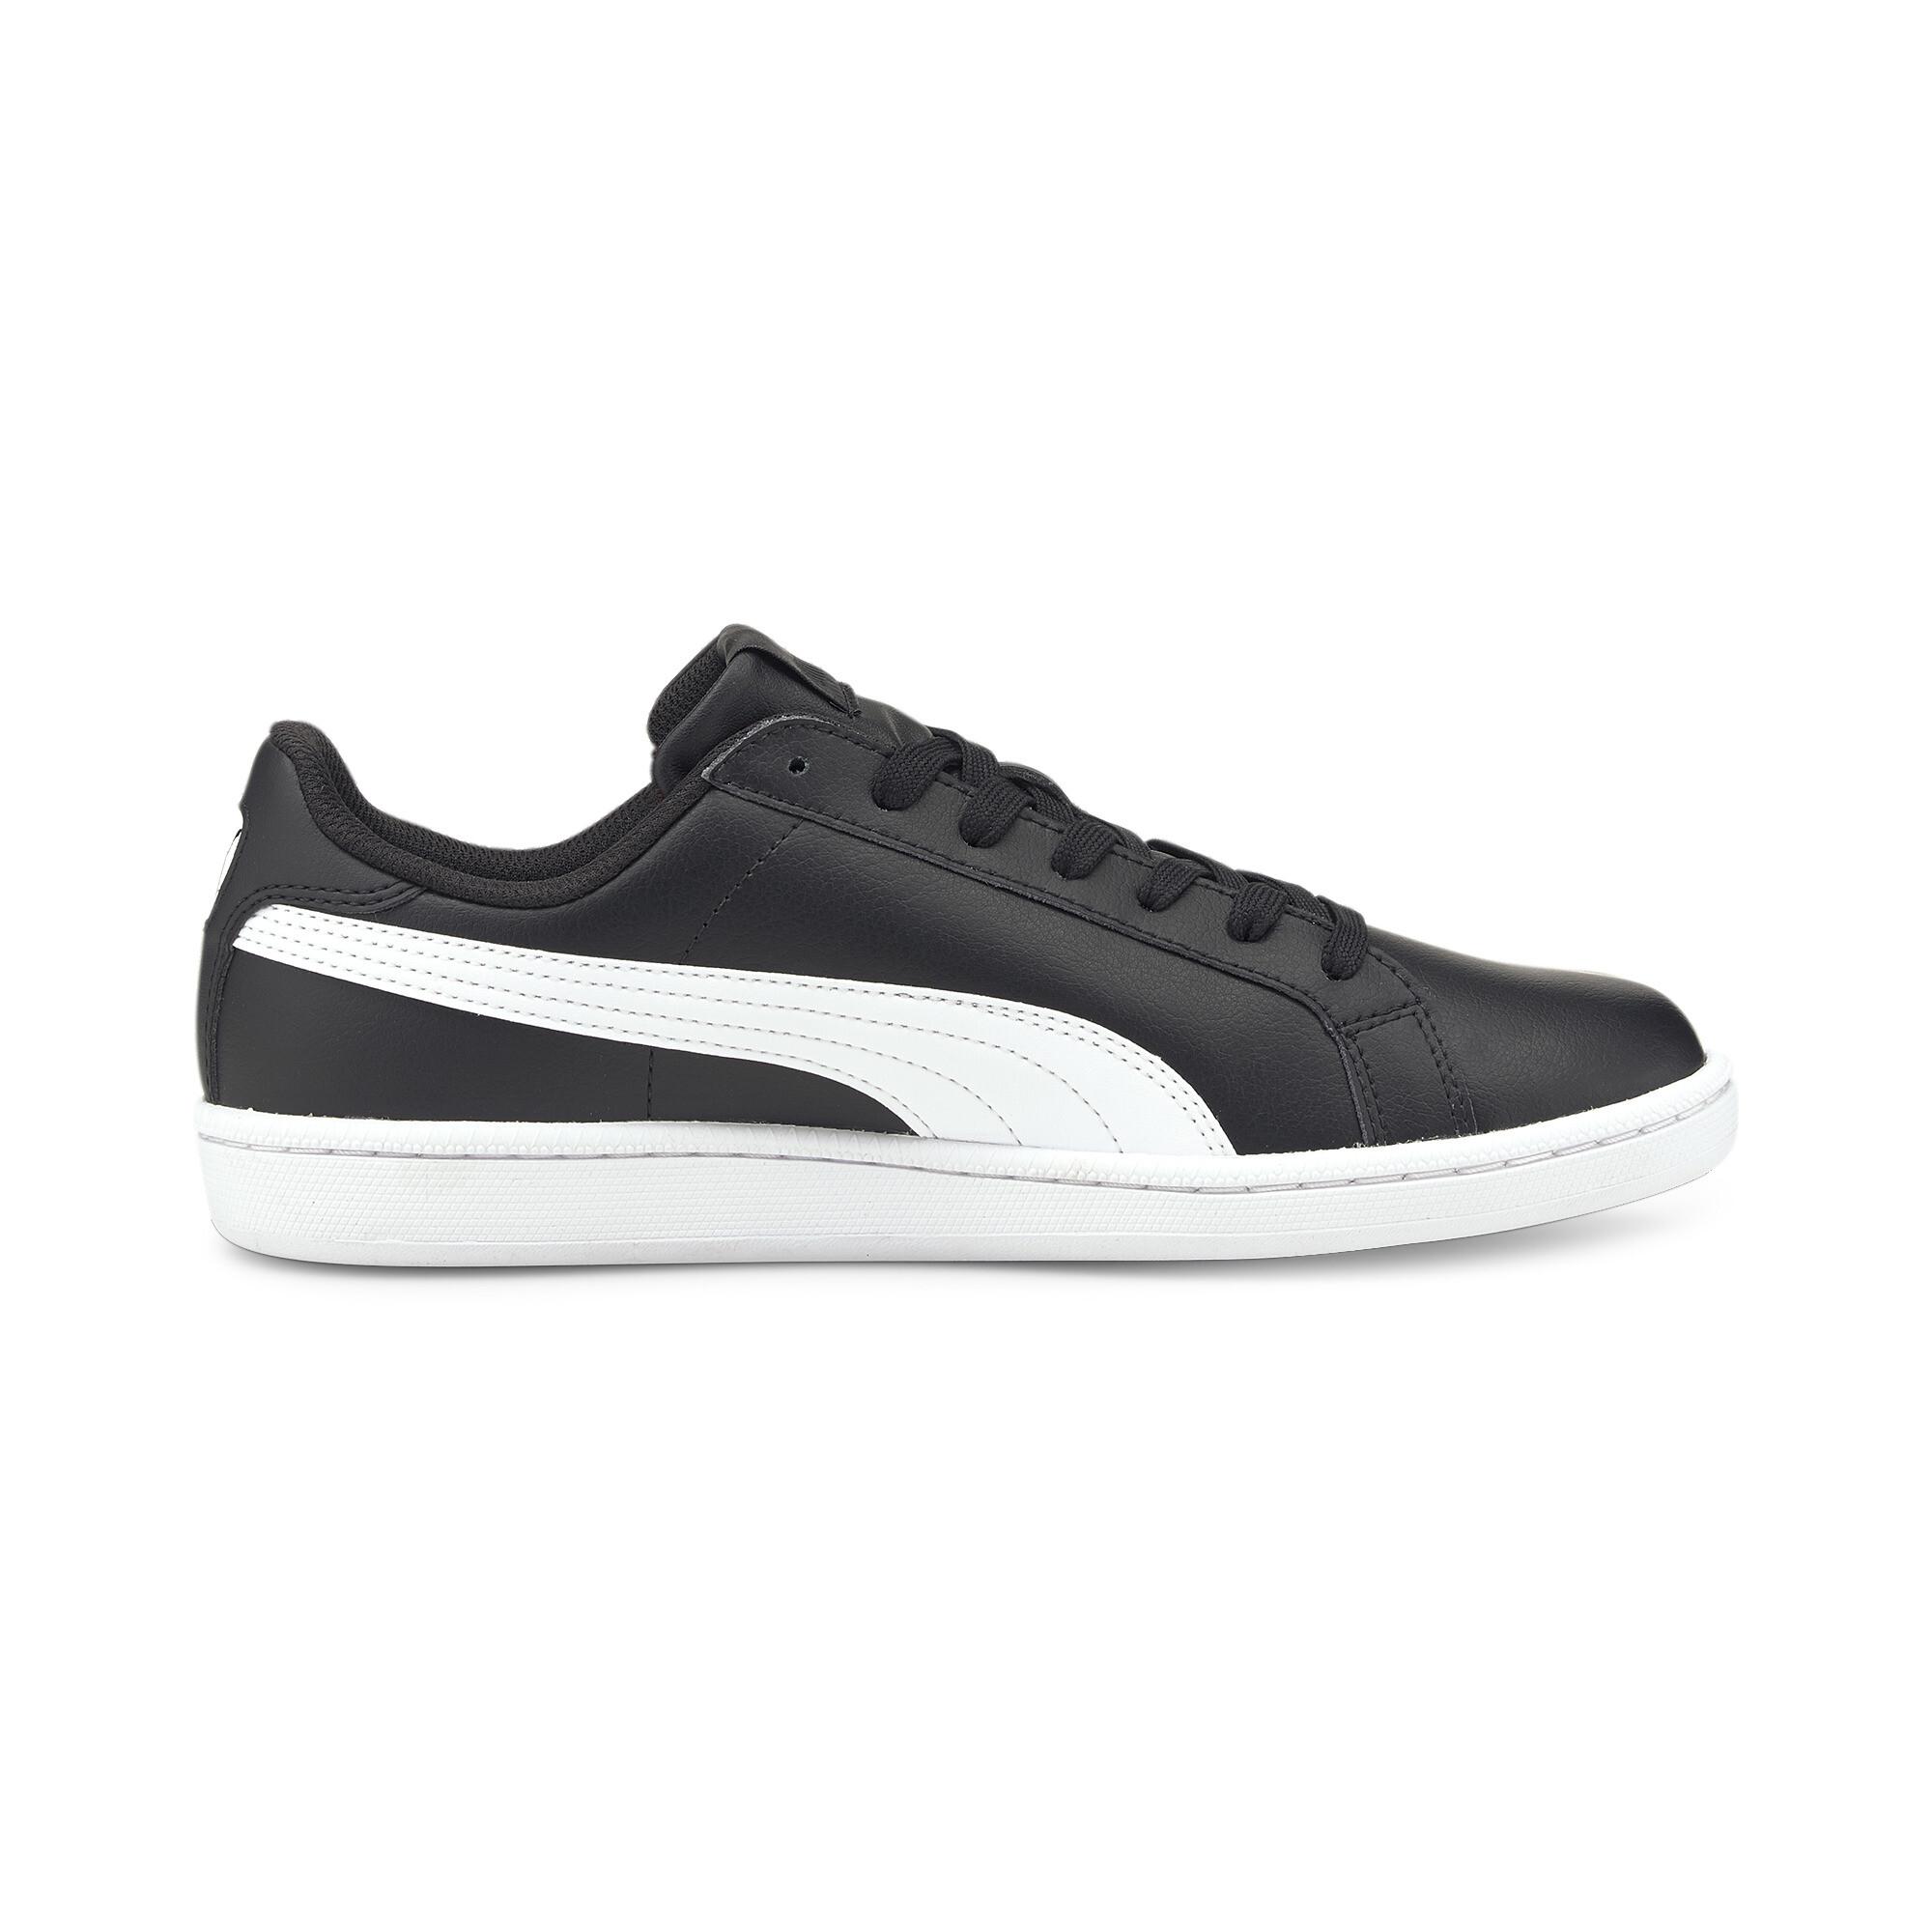 PUMA-Smash-Trainers-Schuhe-Sneakers-Sport-Classics-Unisex-Neu Indexbild 21